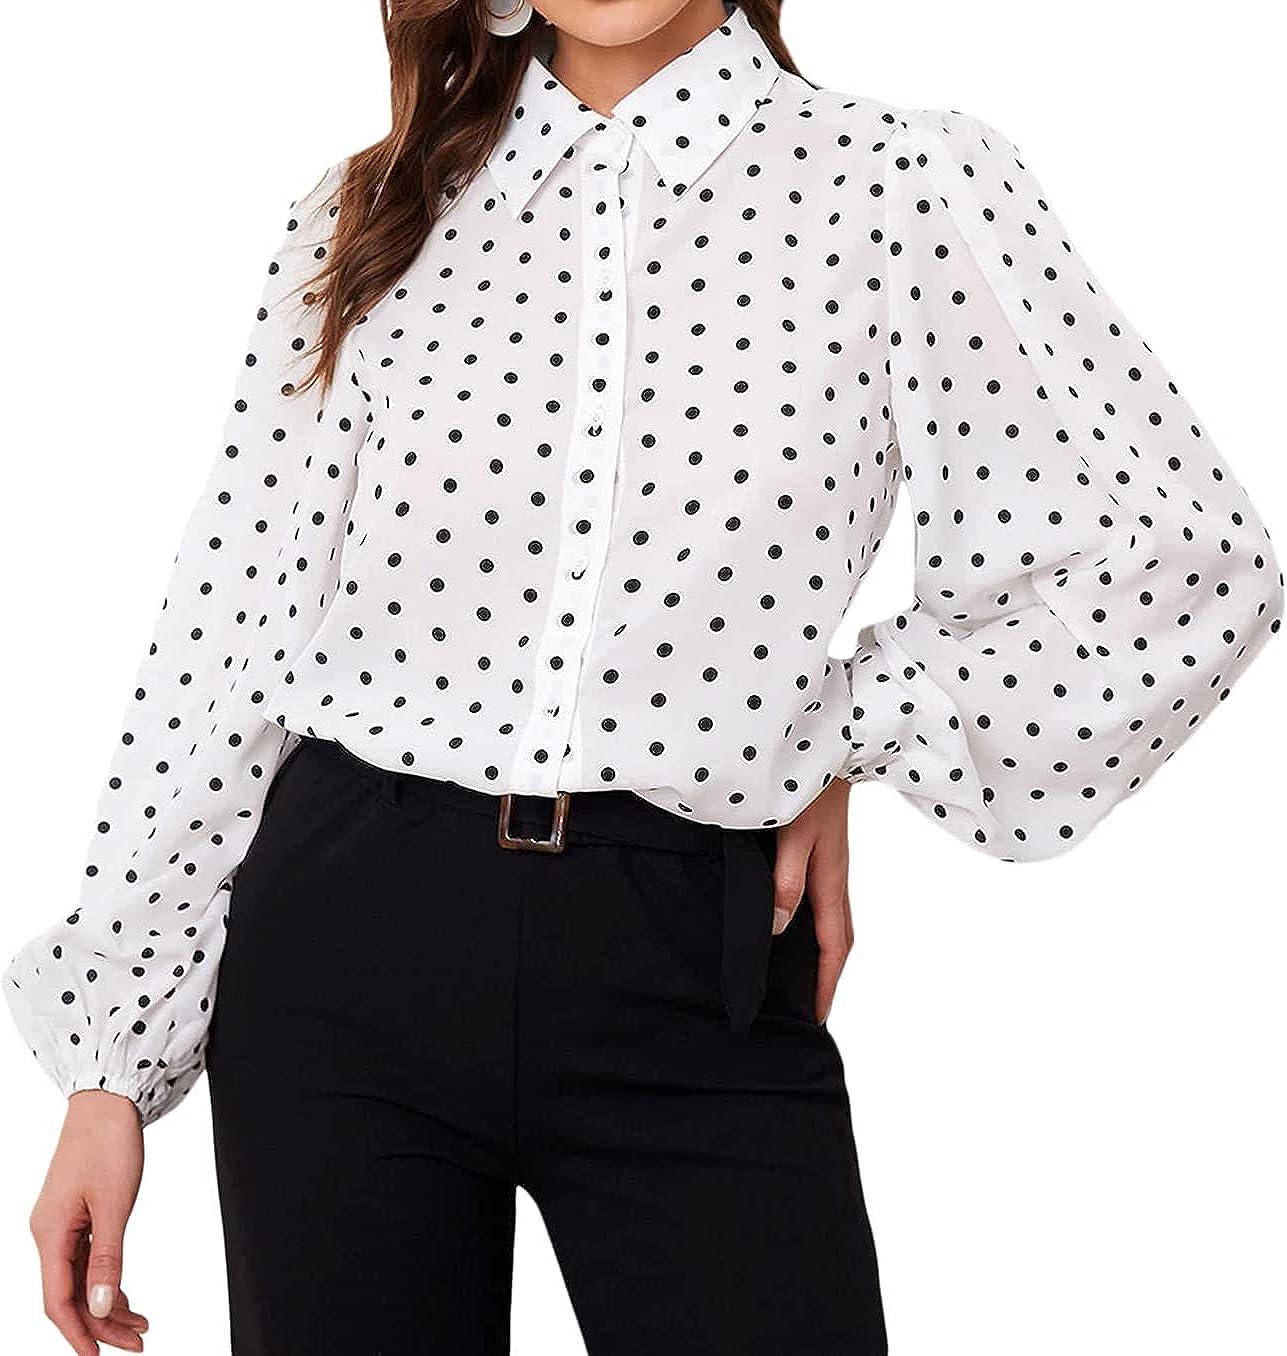 Verdusa Women's Blouse Top Polka Dots Print Bishop Sleeve Button Up Shirt